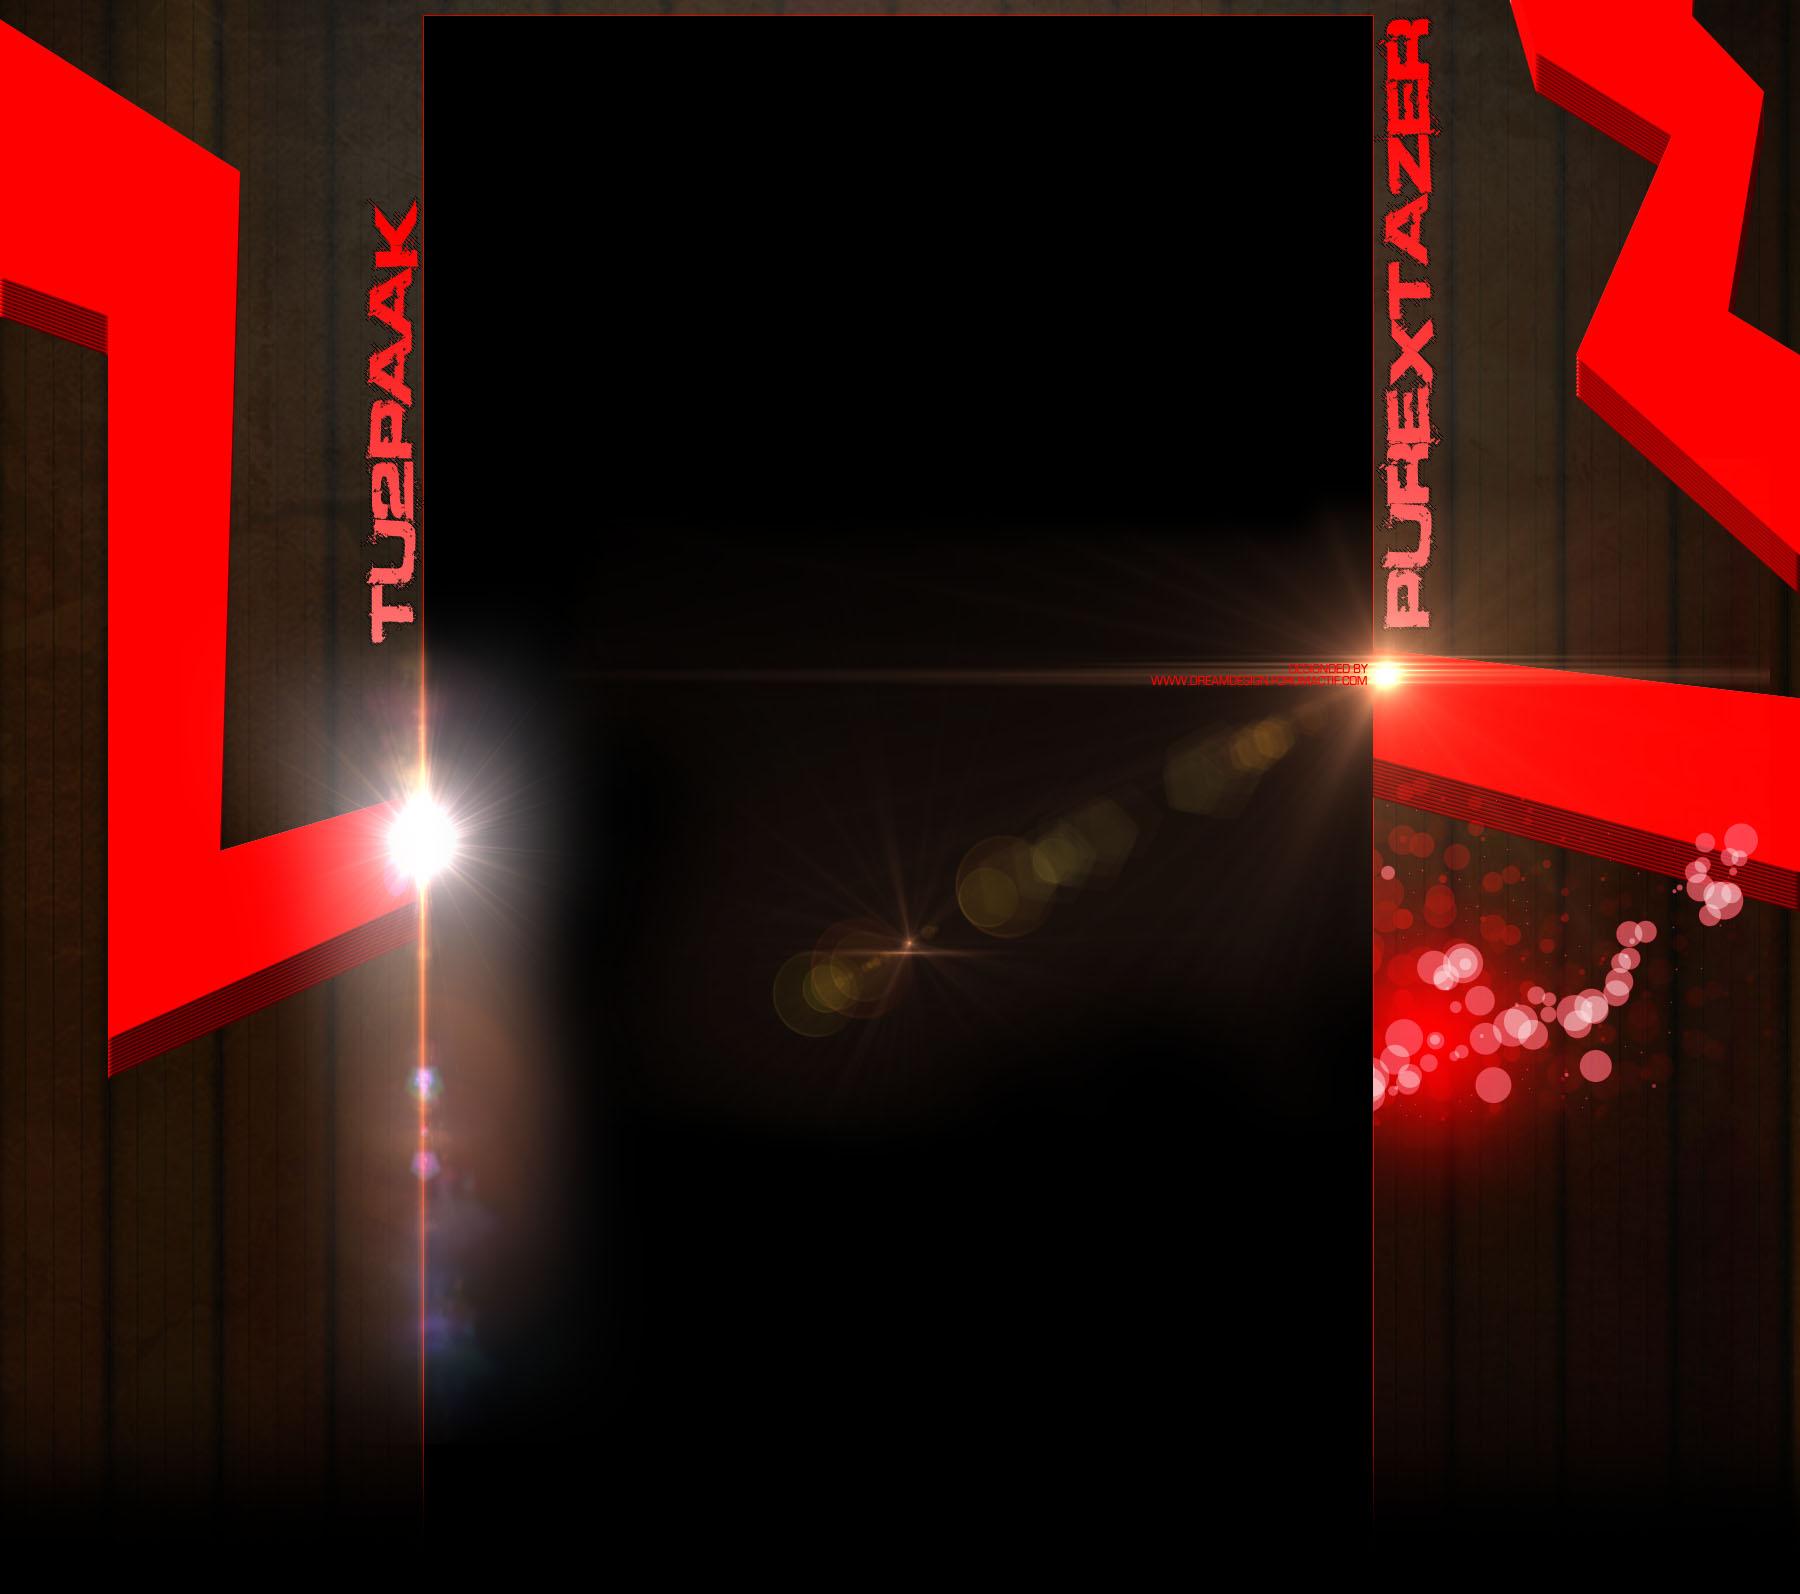 Commande background youtube de Tu2paaK 1324293951037497000